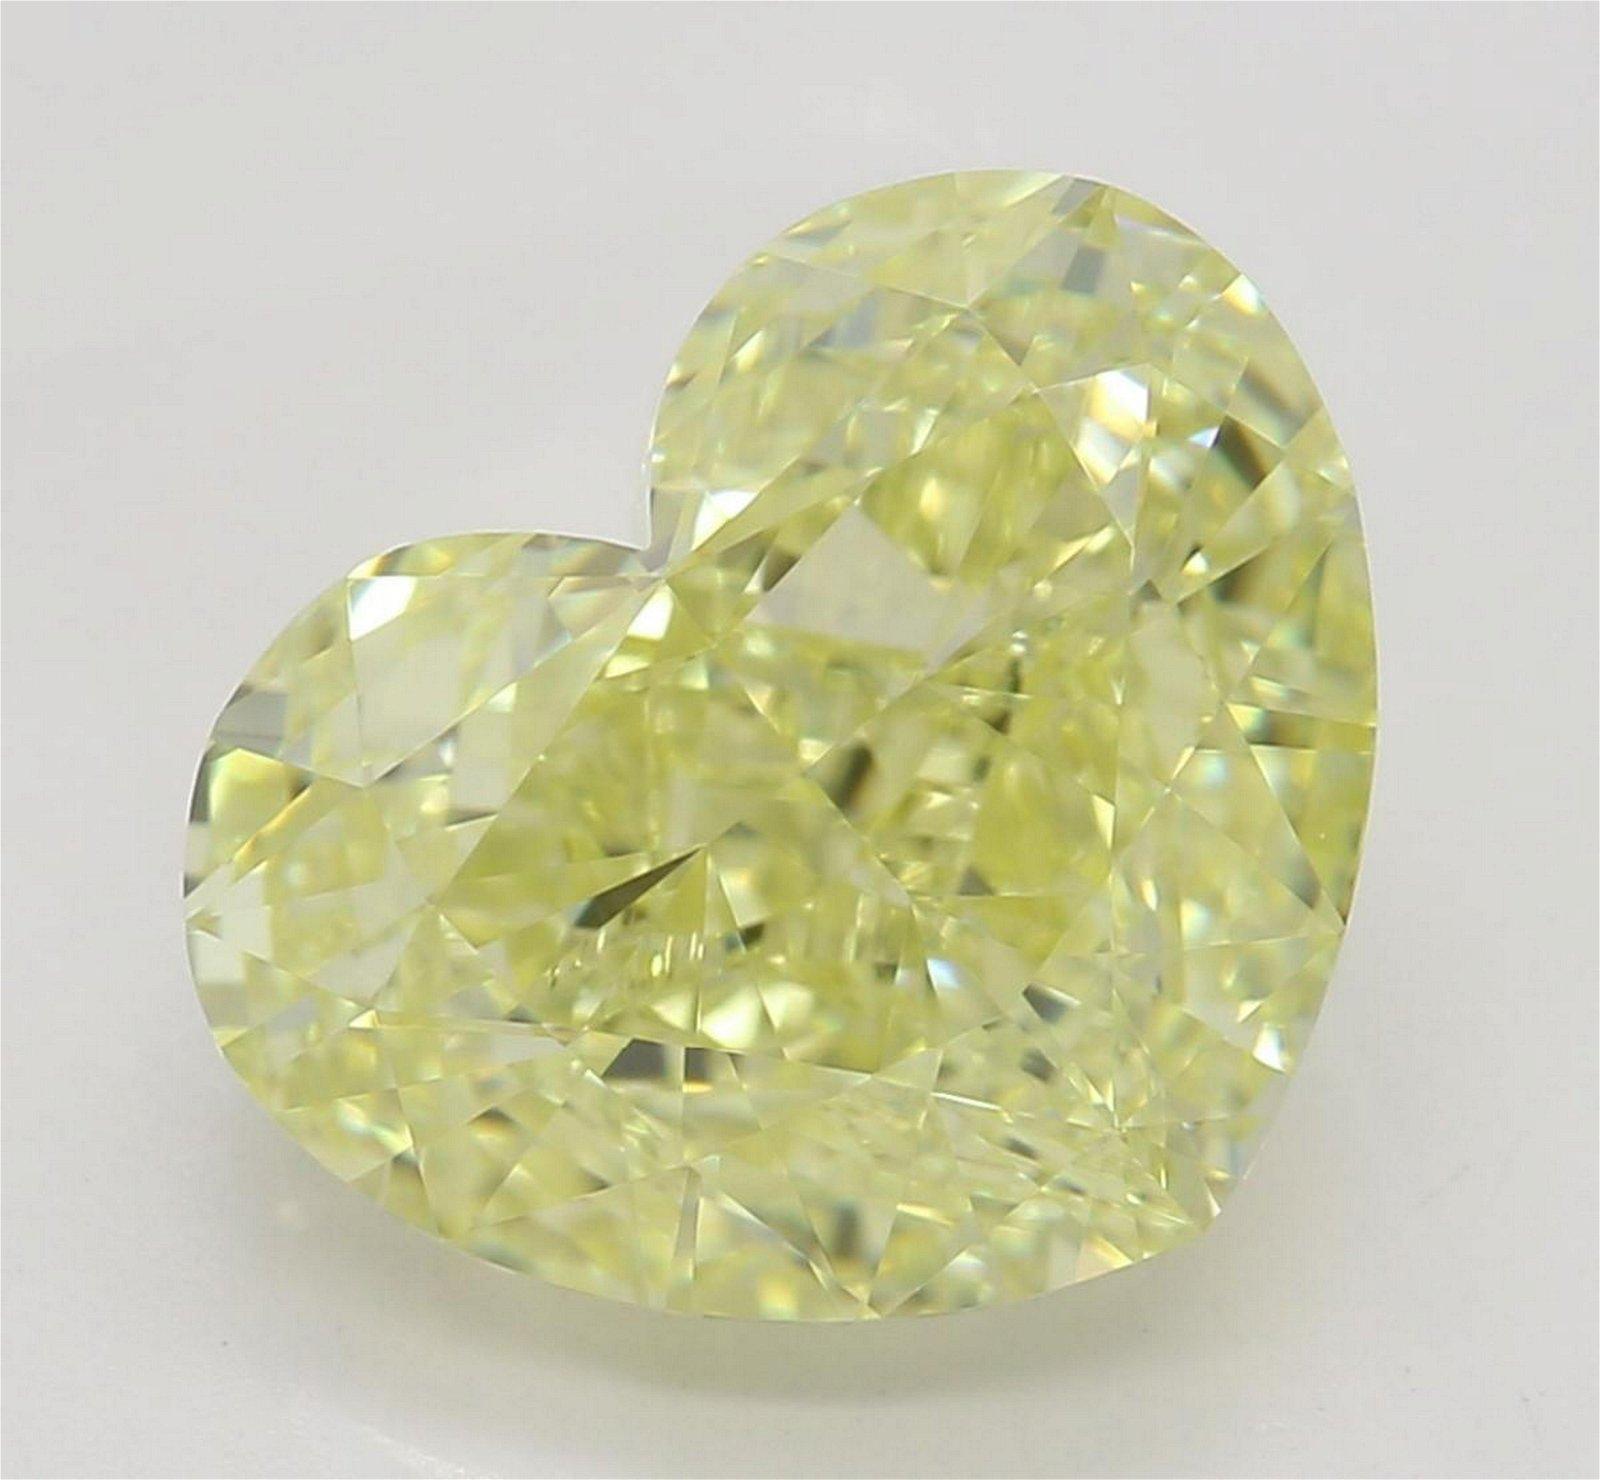 3.50 ct, Yellow/VVS1, Heart cut Diamond